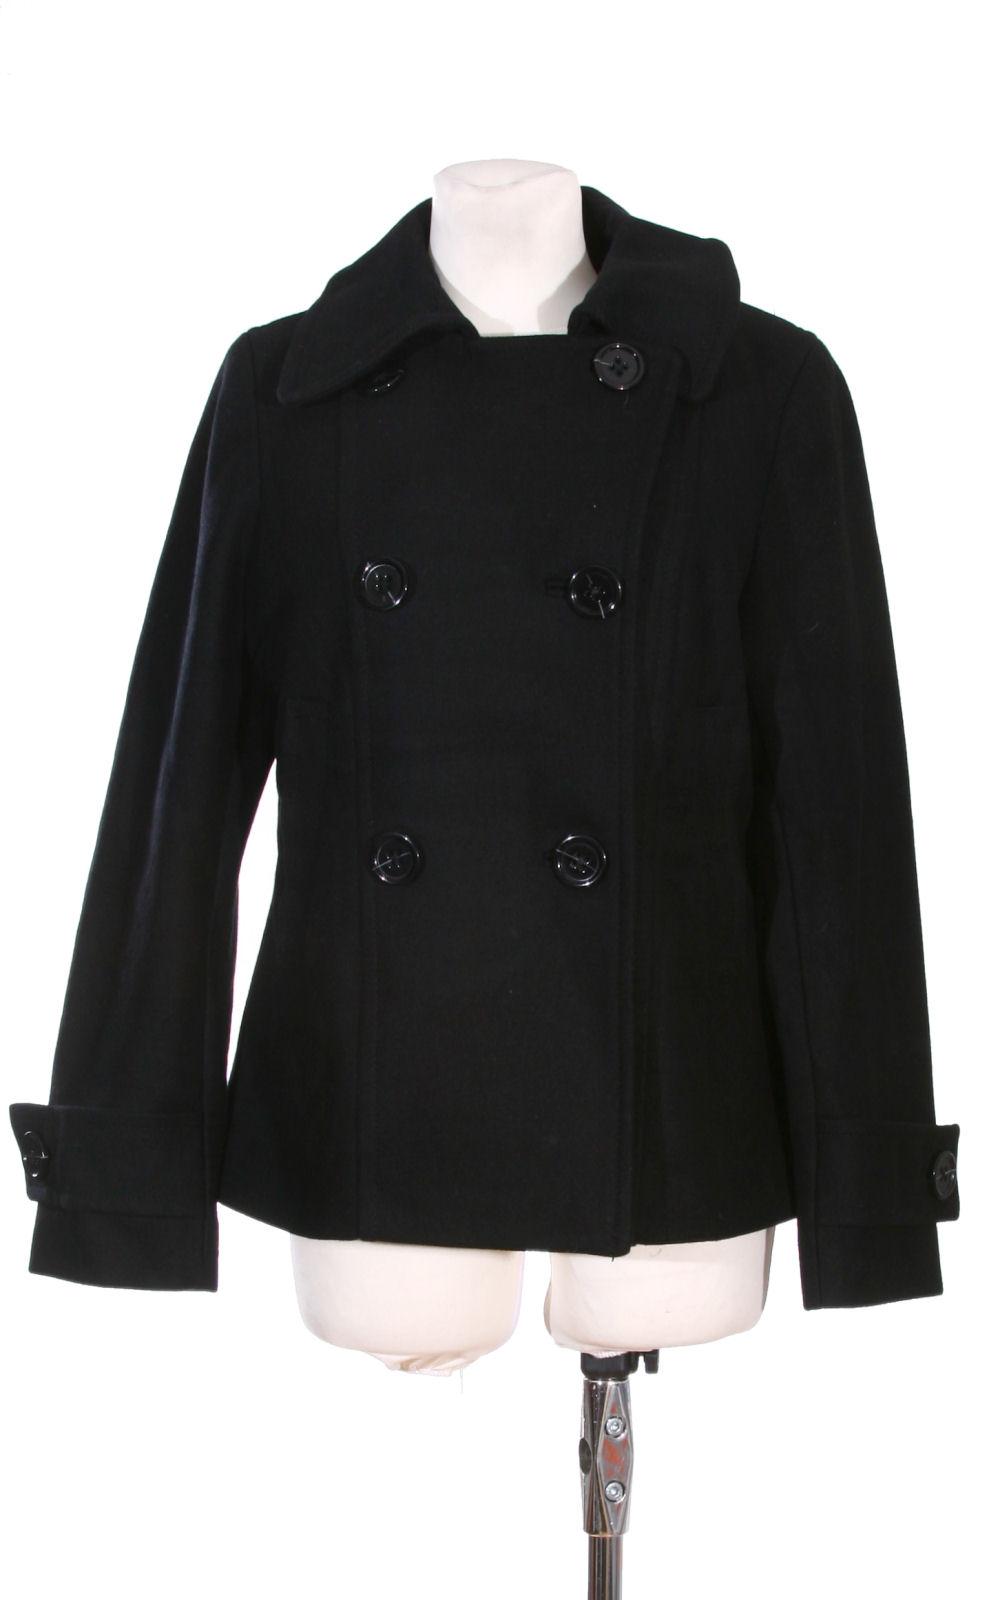 f90e0b1a81 Női ruházat | Női Kabát, H&M, Méret: 42 | http://www.ruhavadasz.hu/